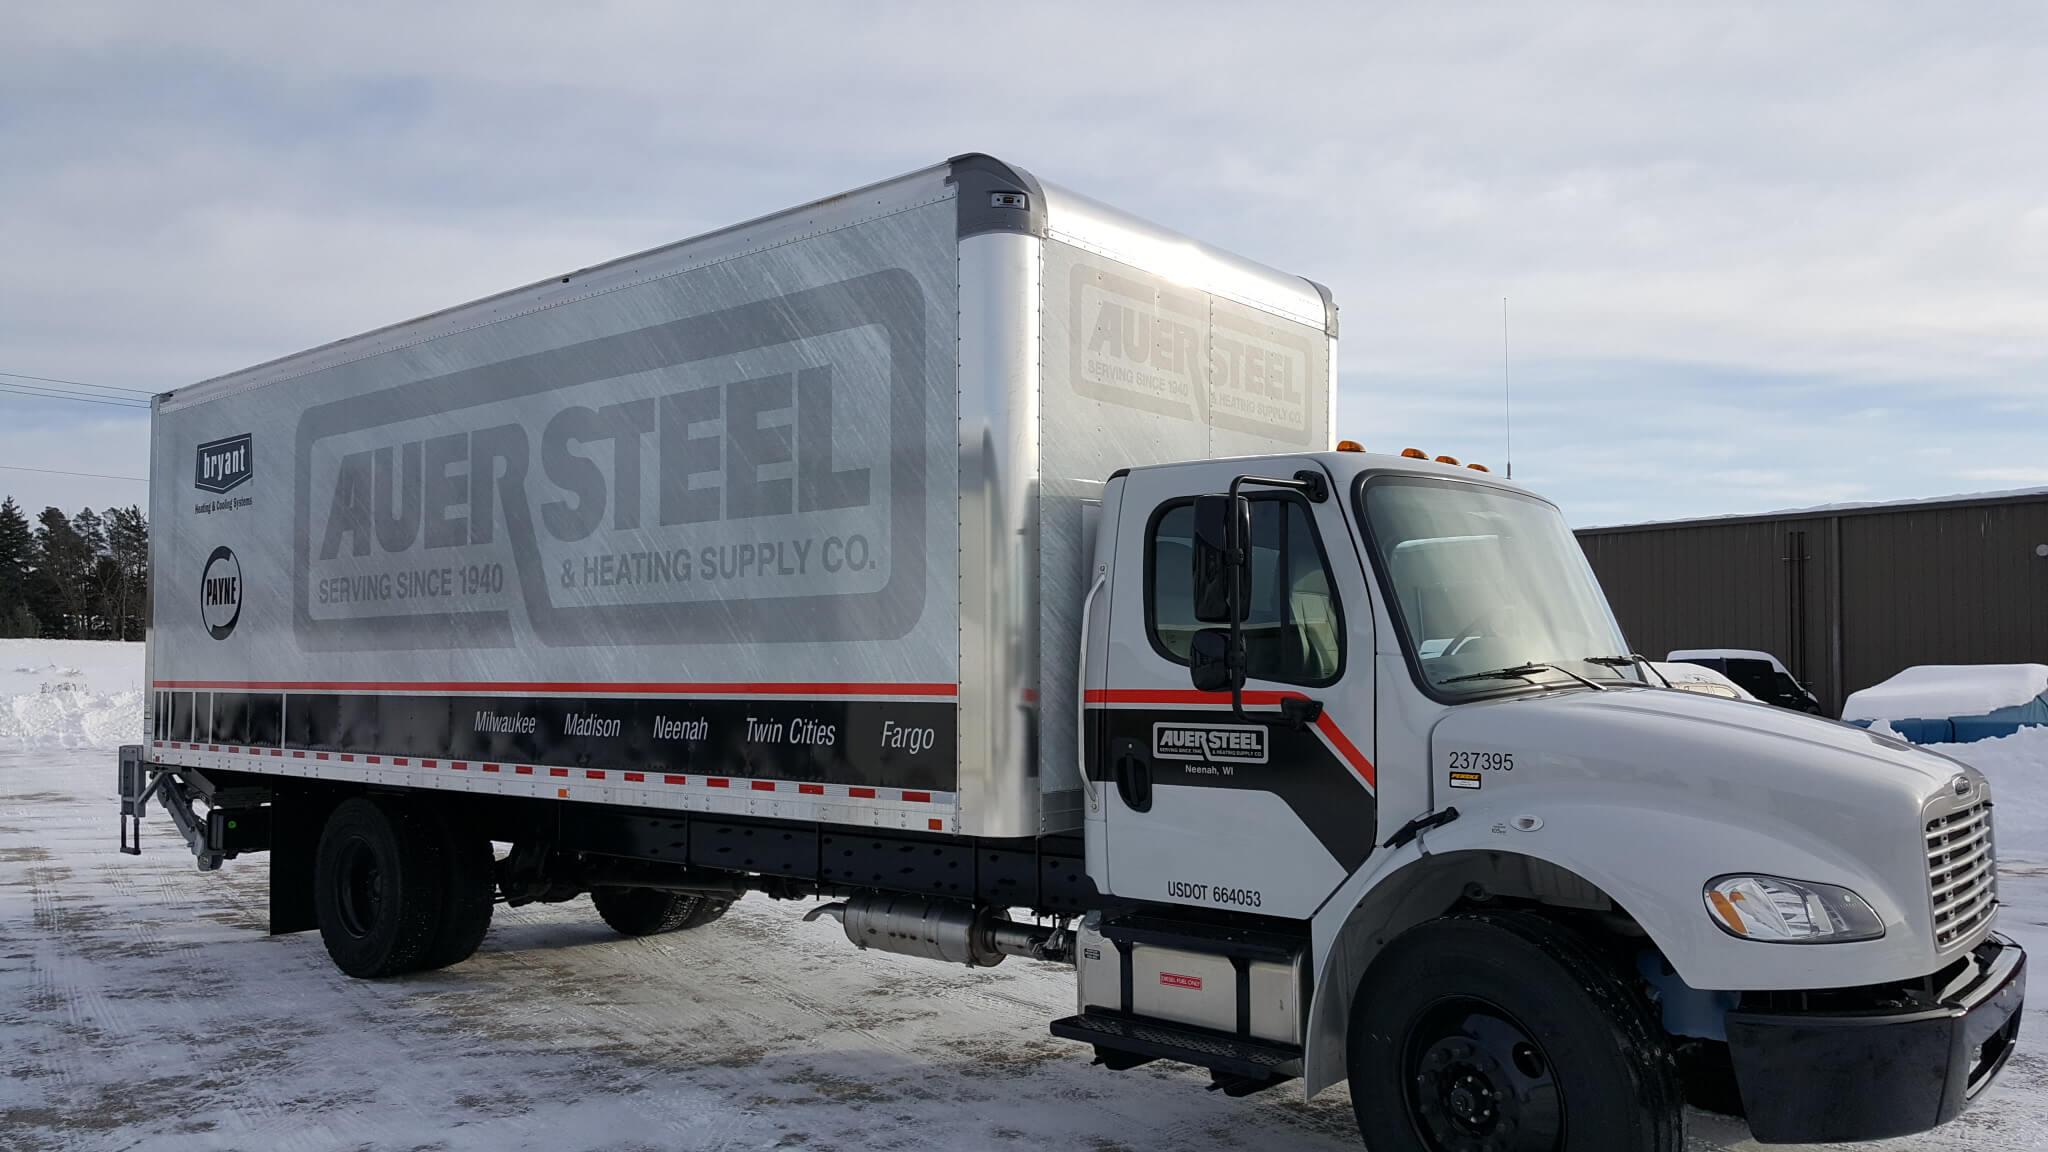 Auer Steel full semi trailer box wrap